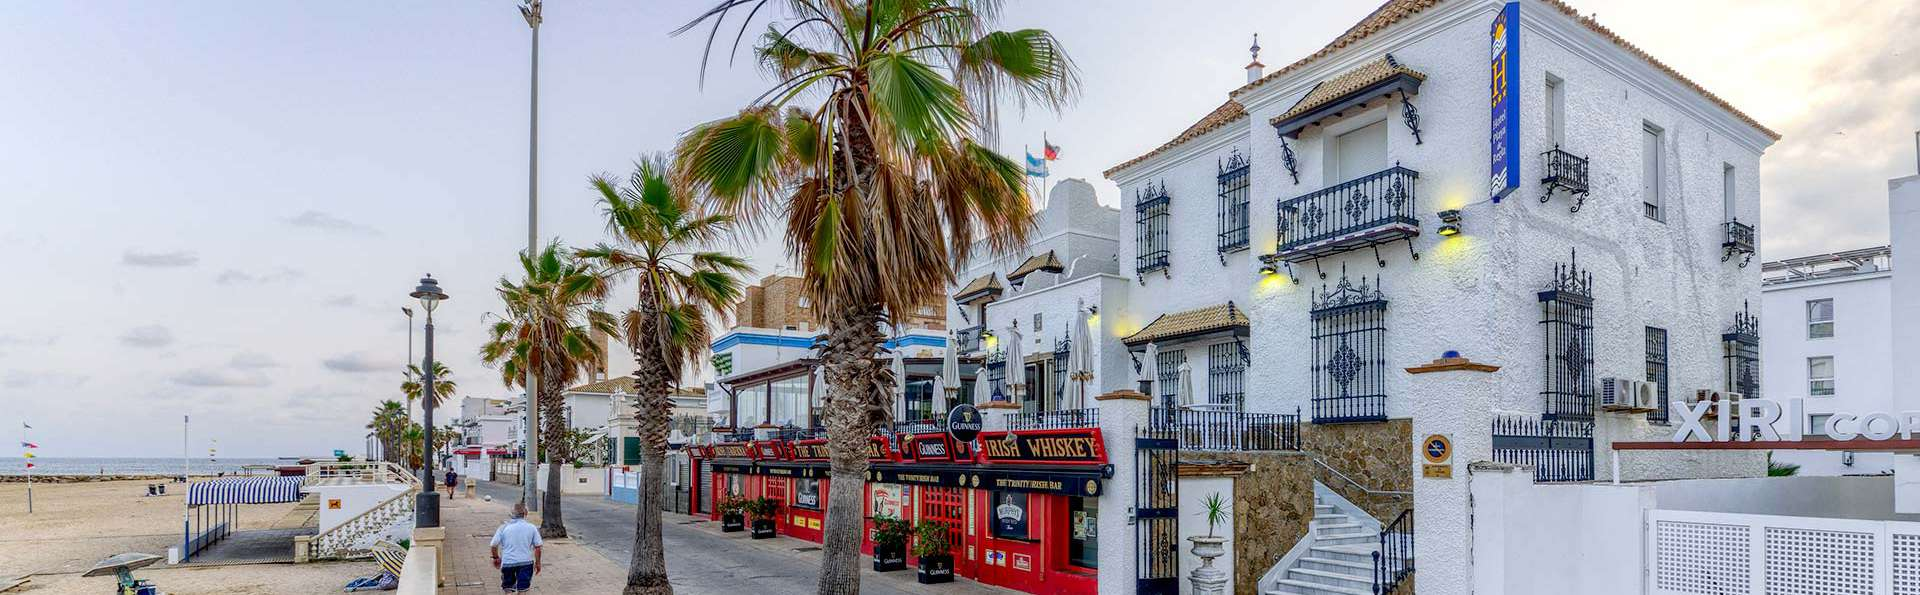 Hotel Playa de Regla - EDIT_NEW_FRONT3.jpg